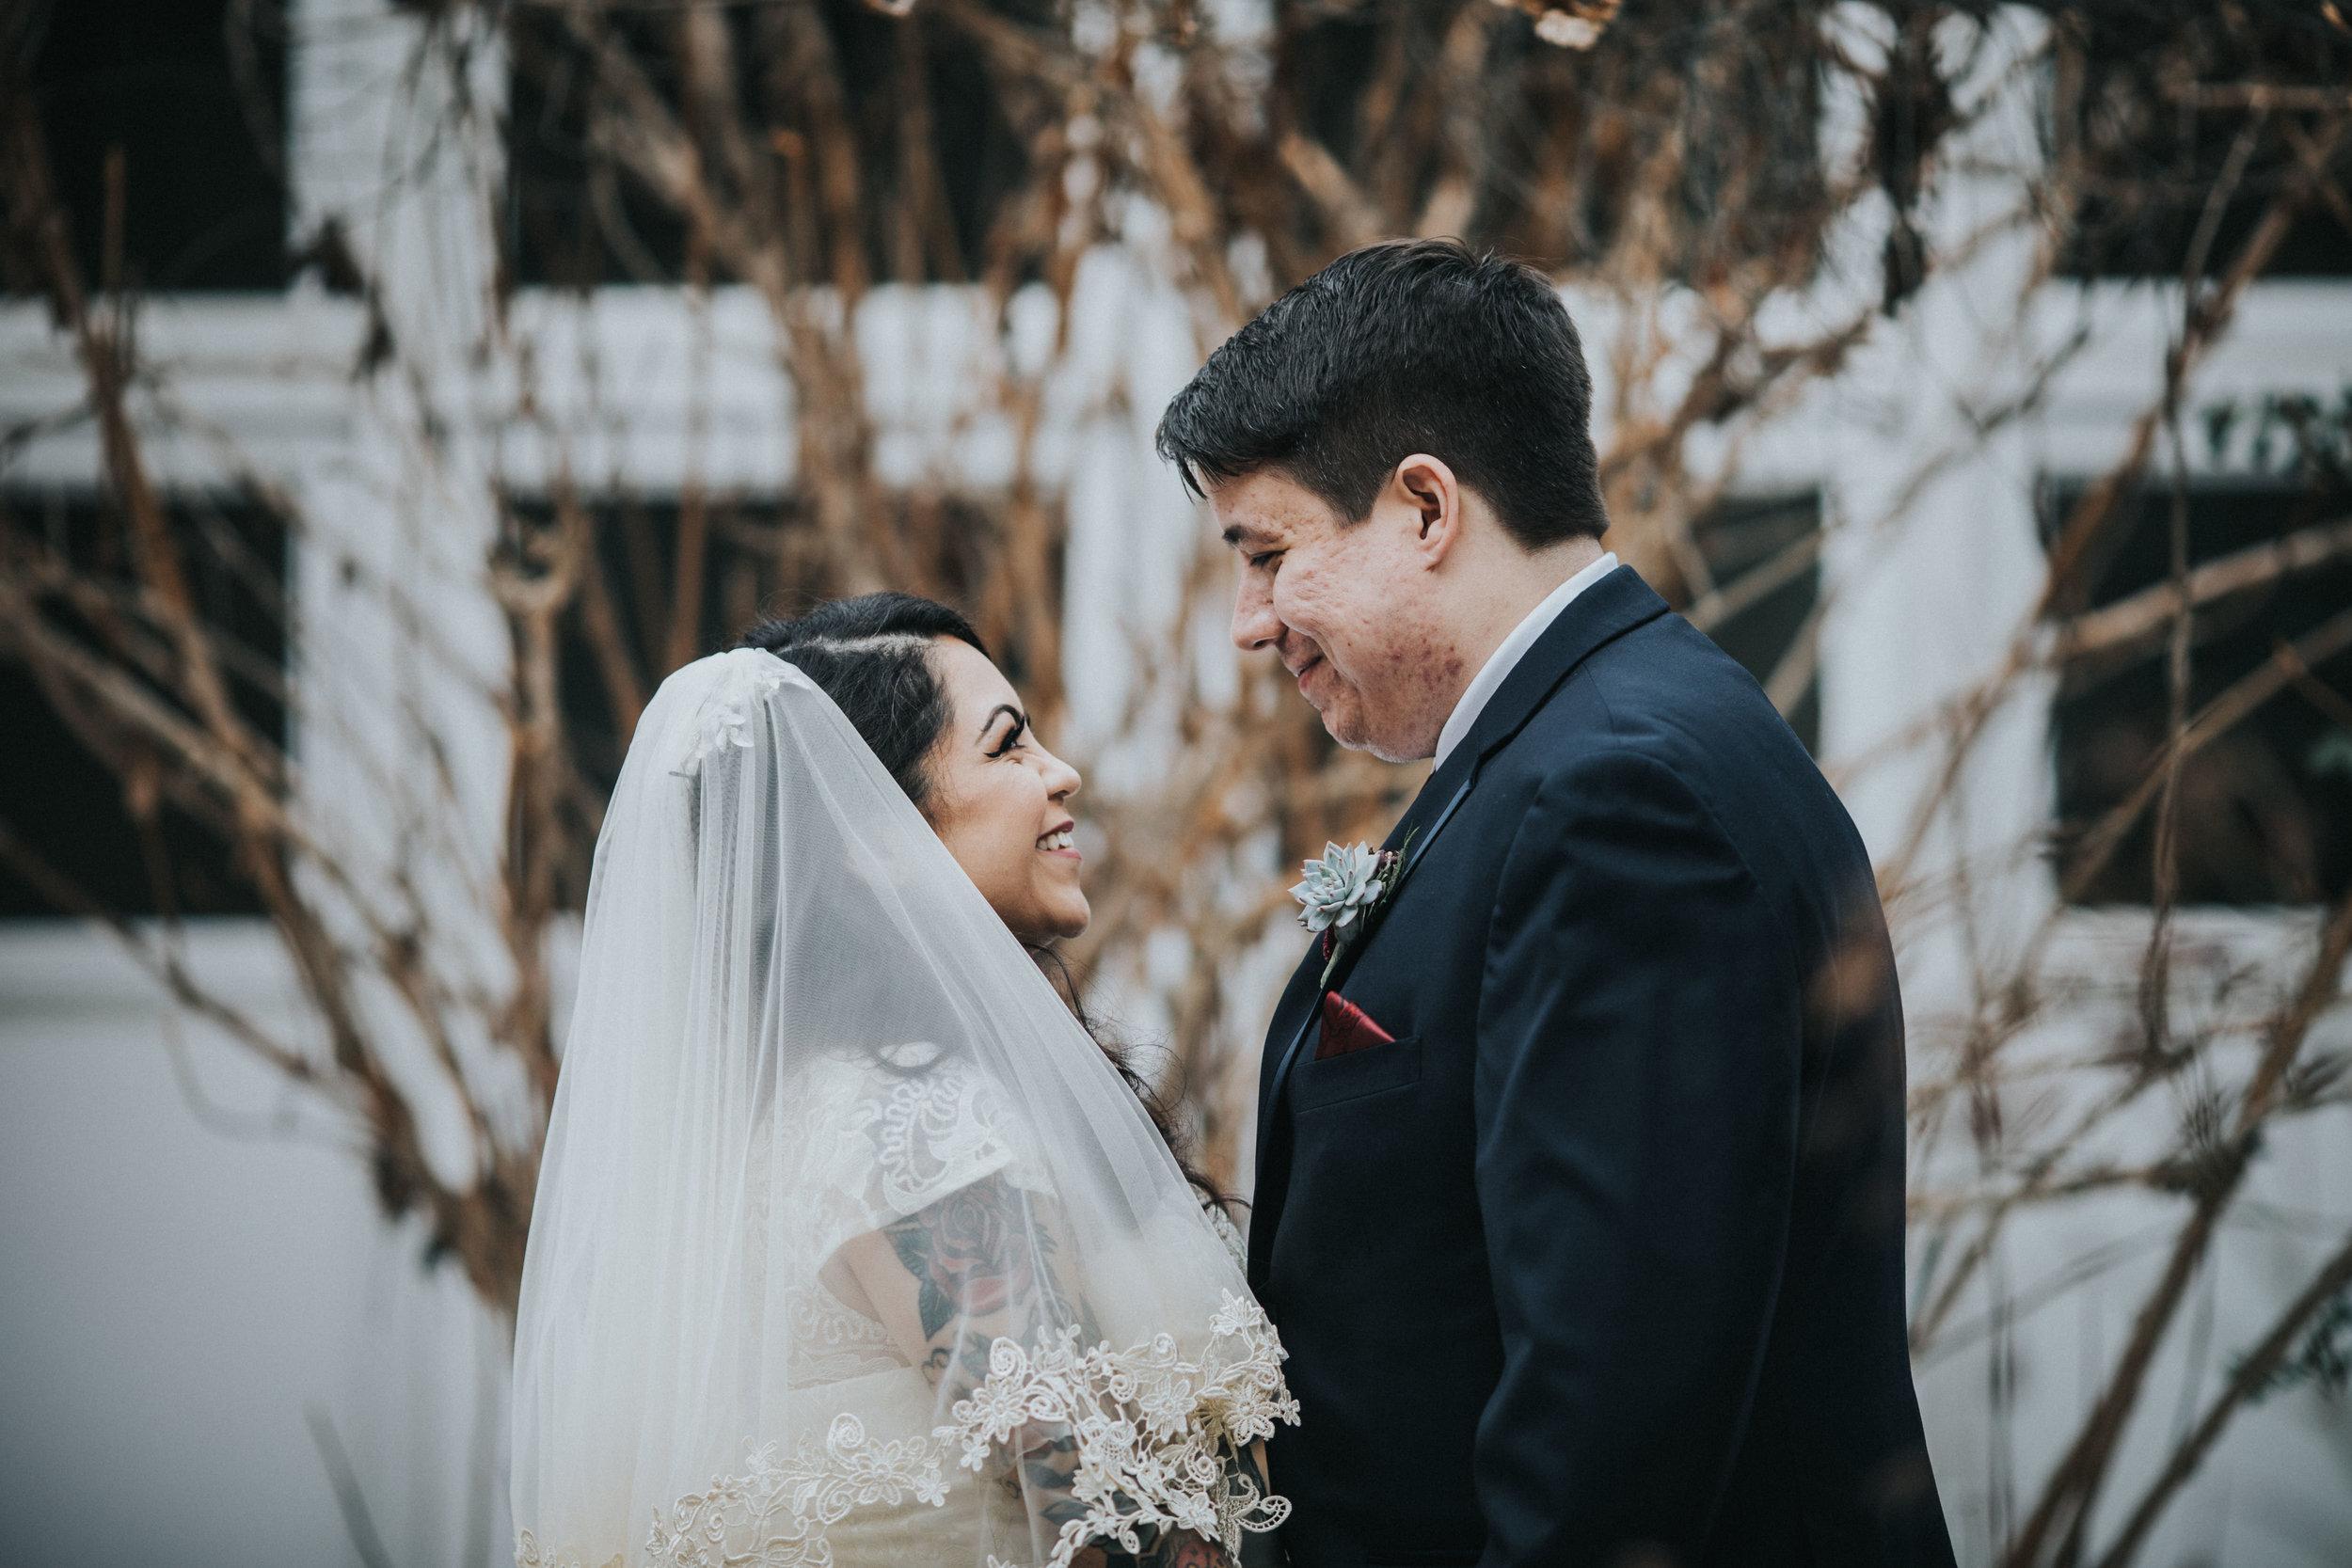 New-Jersey-Wedding-Photographer-ReceptionCenter-Valeria&Mike-First-Look-Bride&Groom (39 of 69).jpg